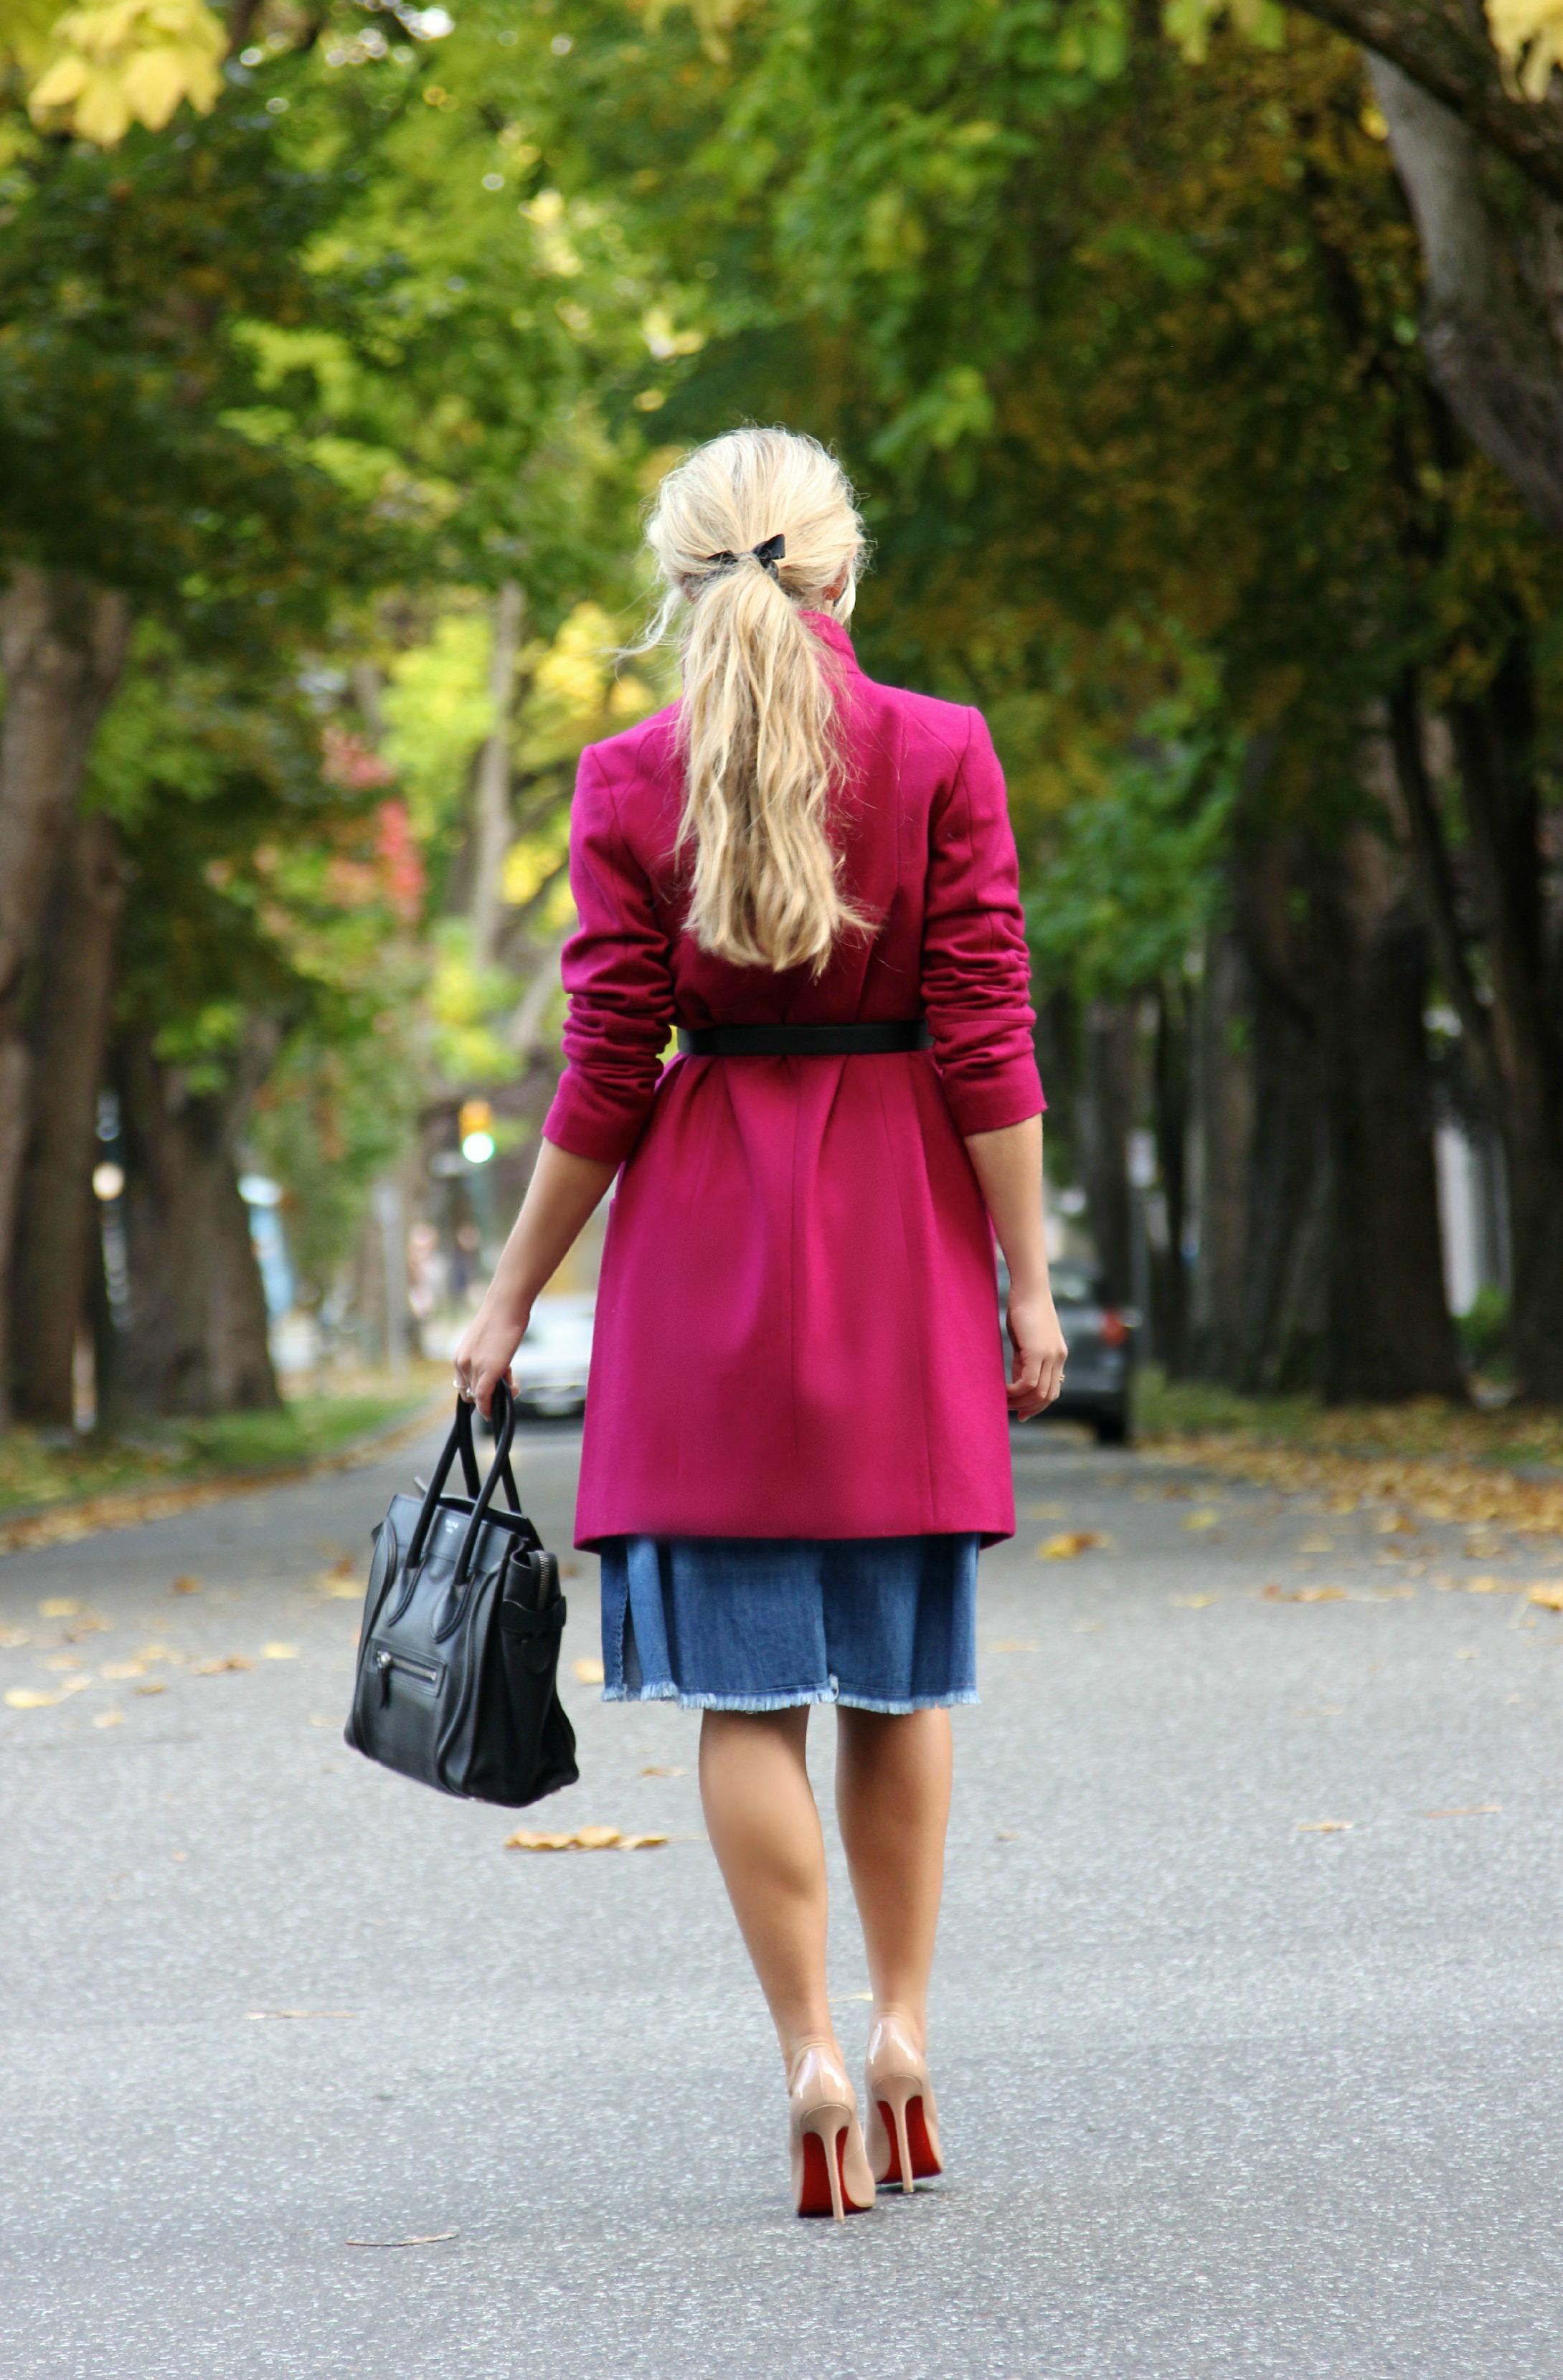 RW&Co  Coat, Céline Bag &  Shades ,  Chanel  Belt,  Christian Louboutin  Pumps